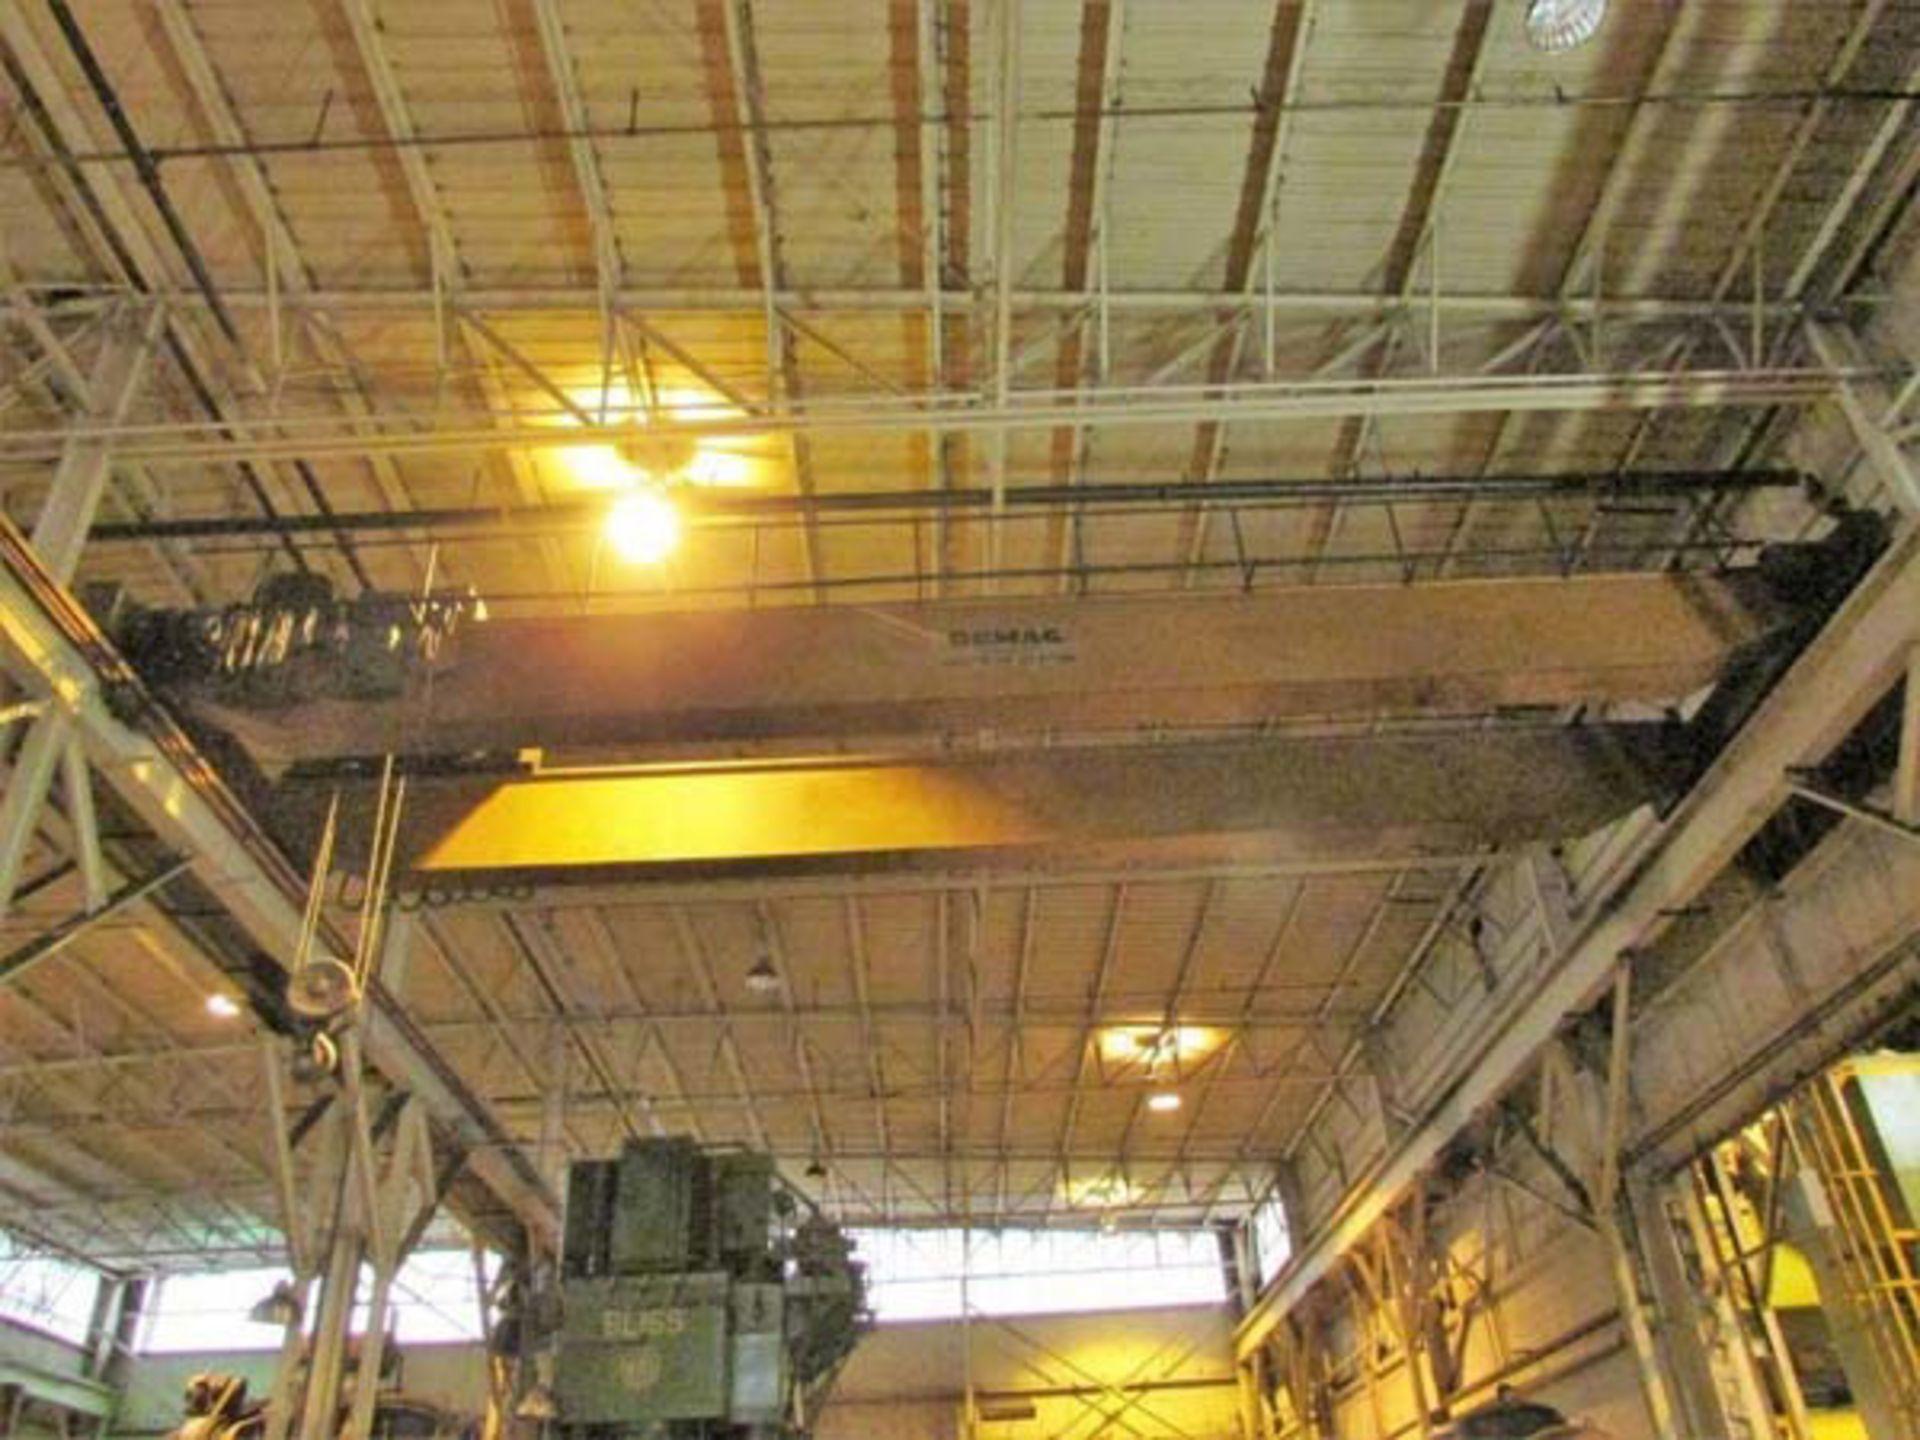 Demag Top Riding Double Girder Bridge Crane | 25-Ton x 50', Mdl: N/A, S/N: 75066 - 8398P - Image 7 of 10